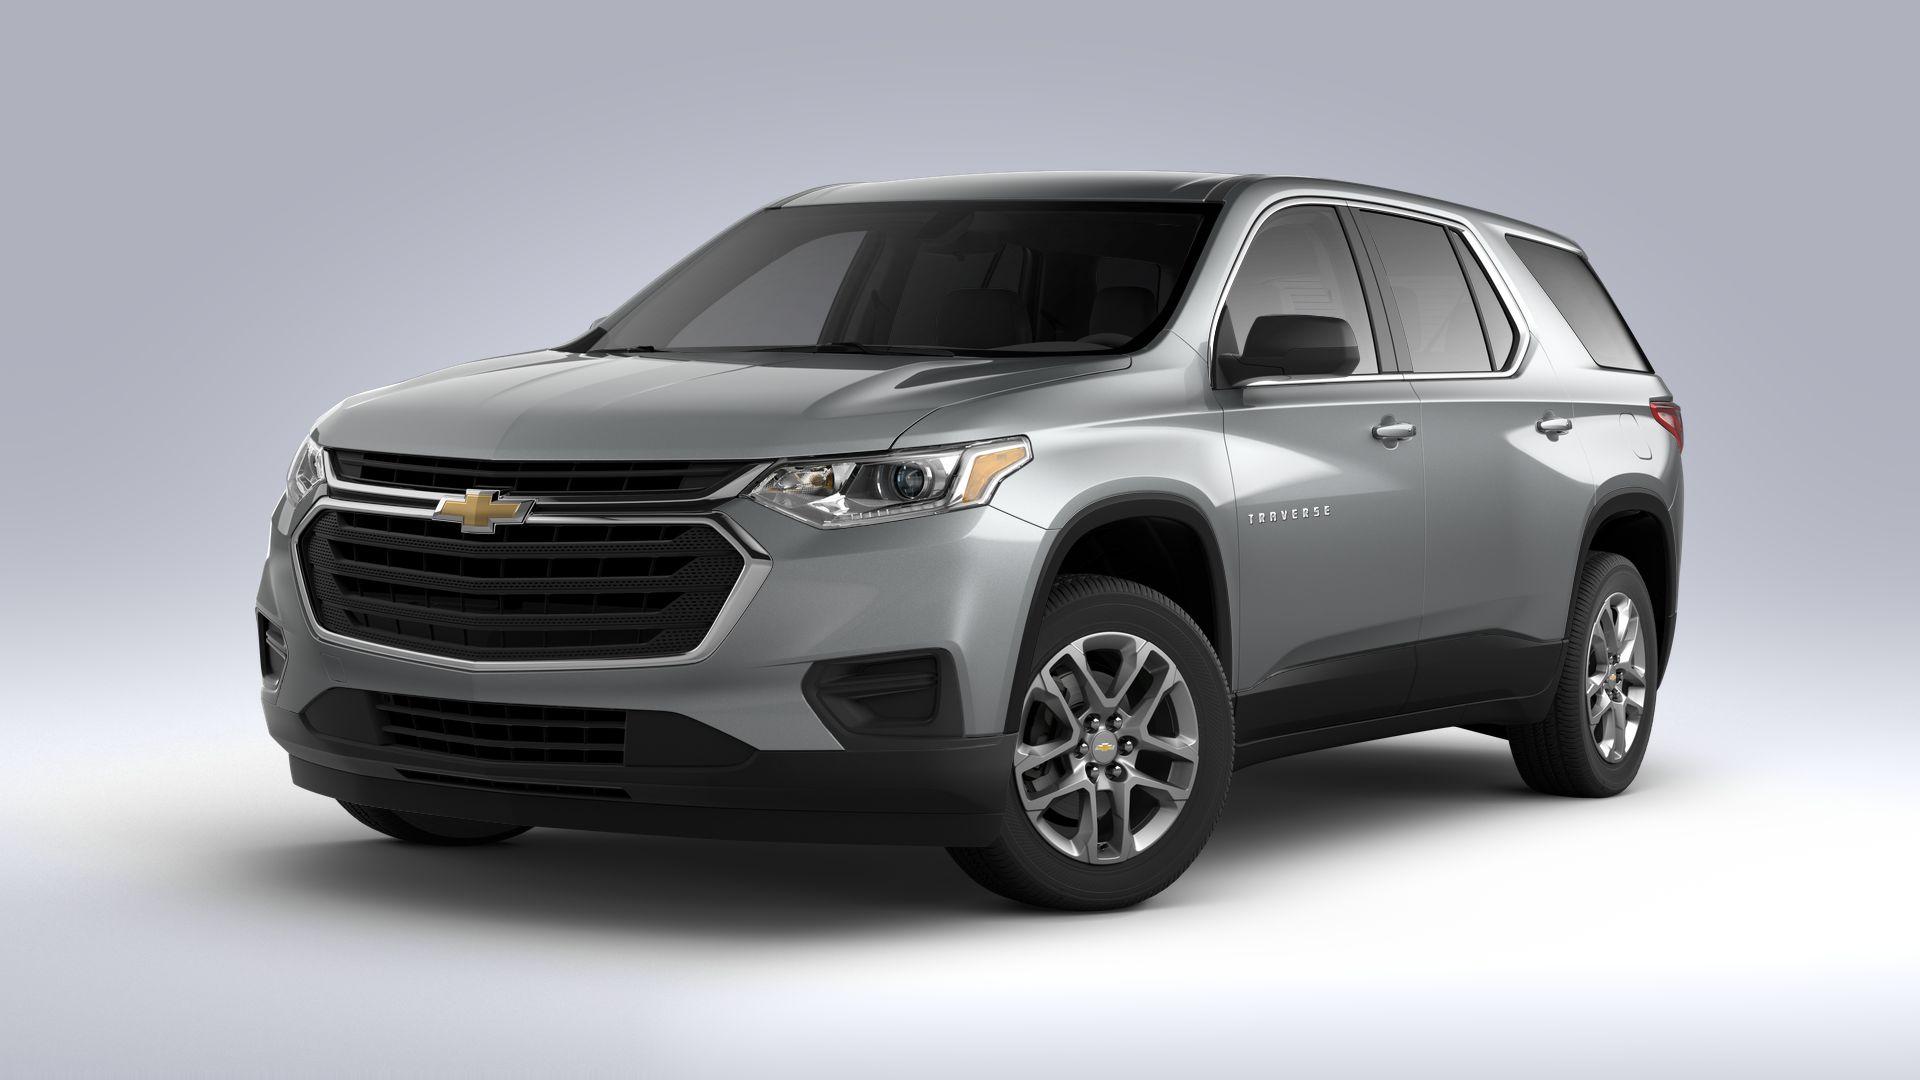 2021 Chevrolet Traverse SUV